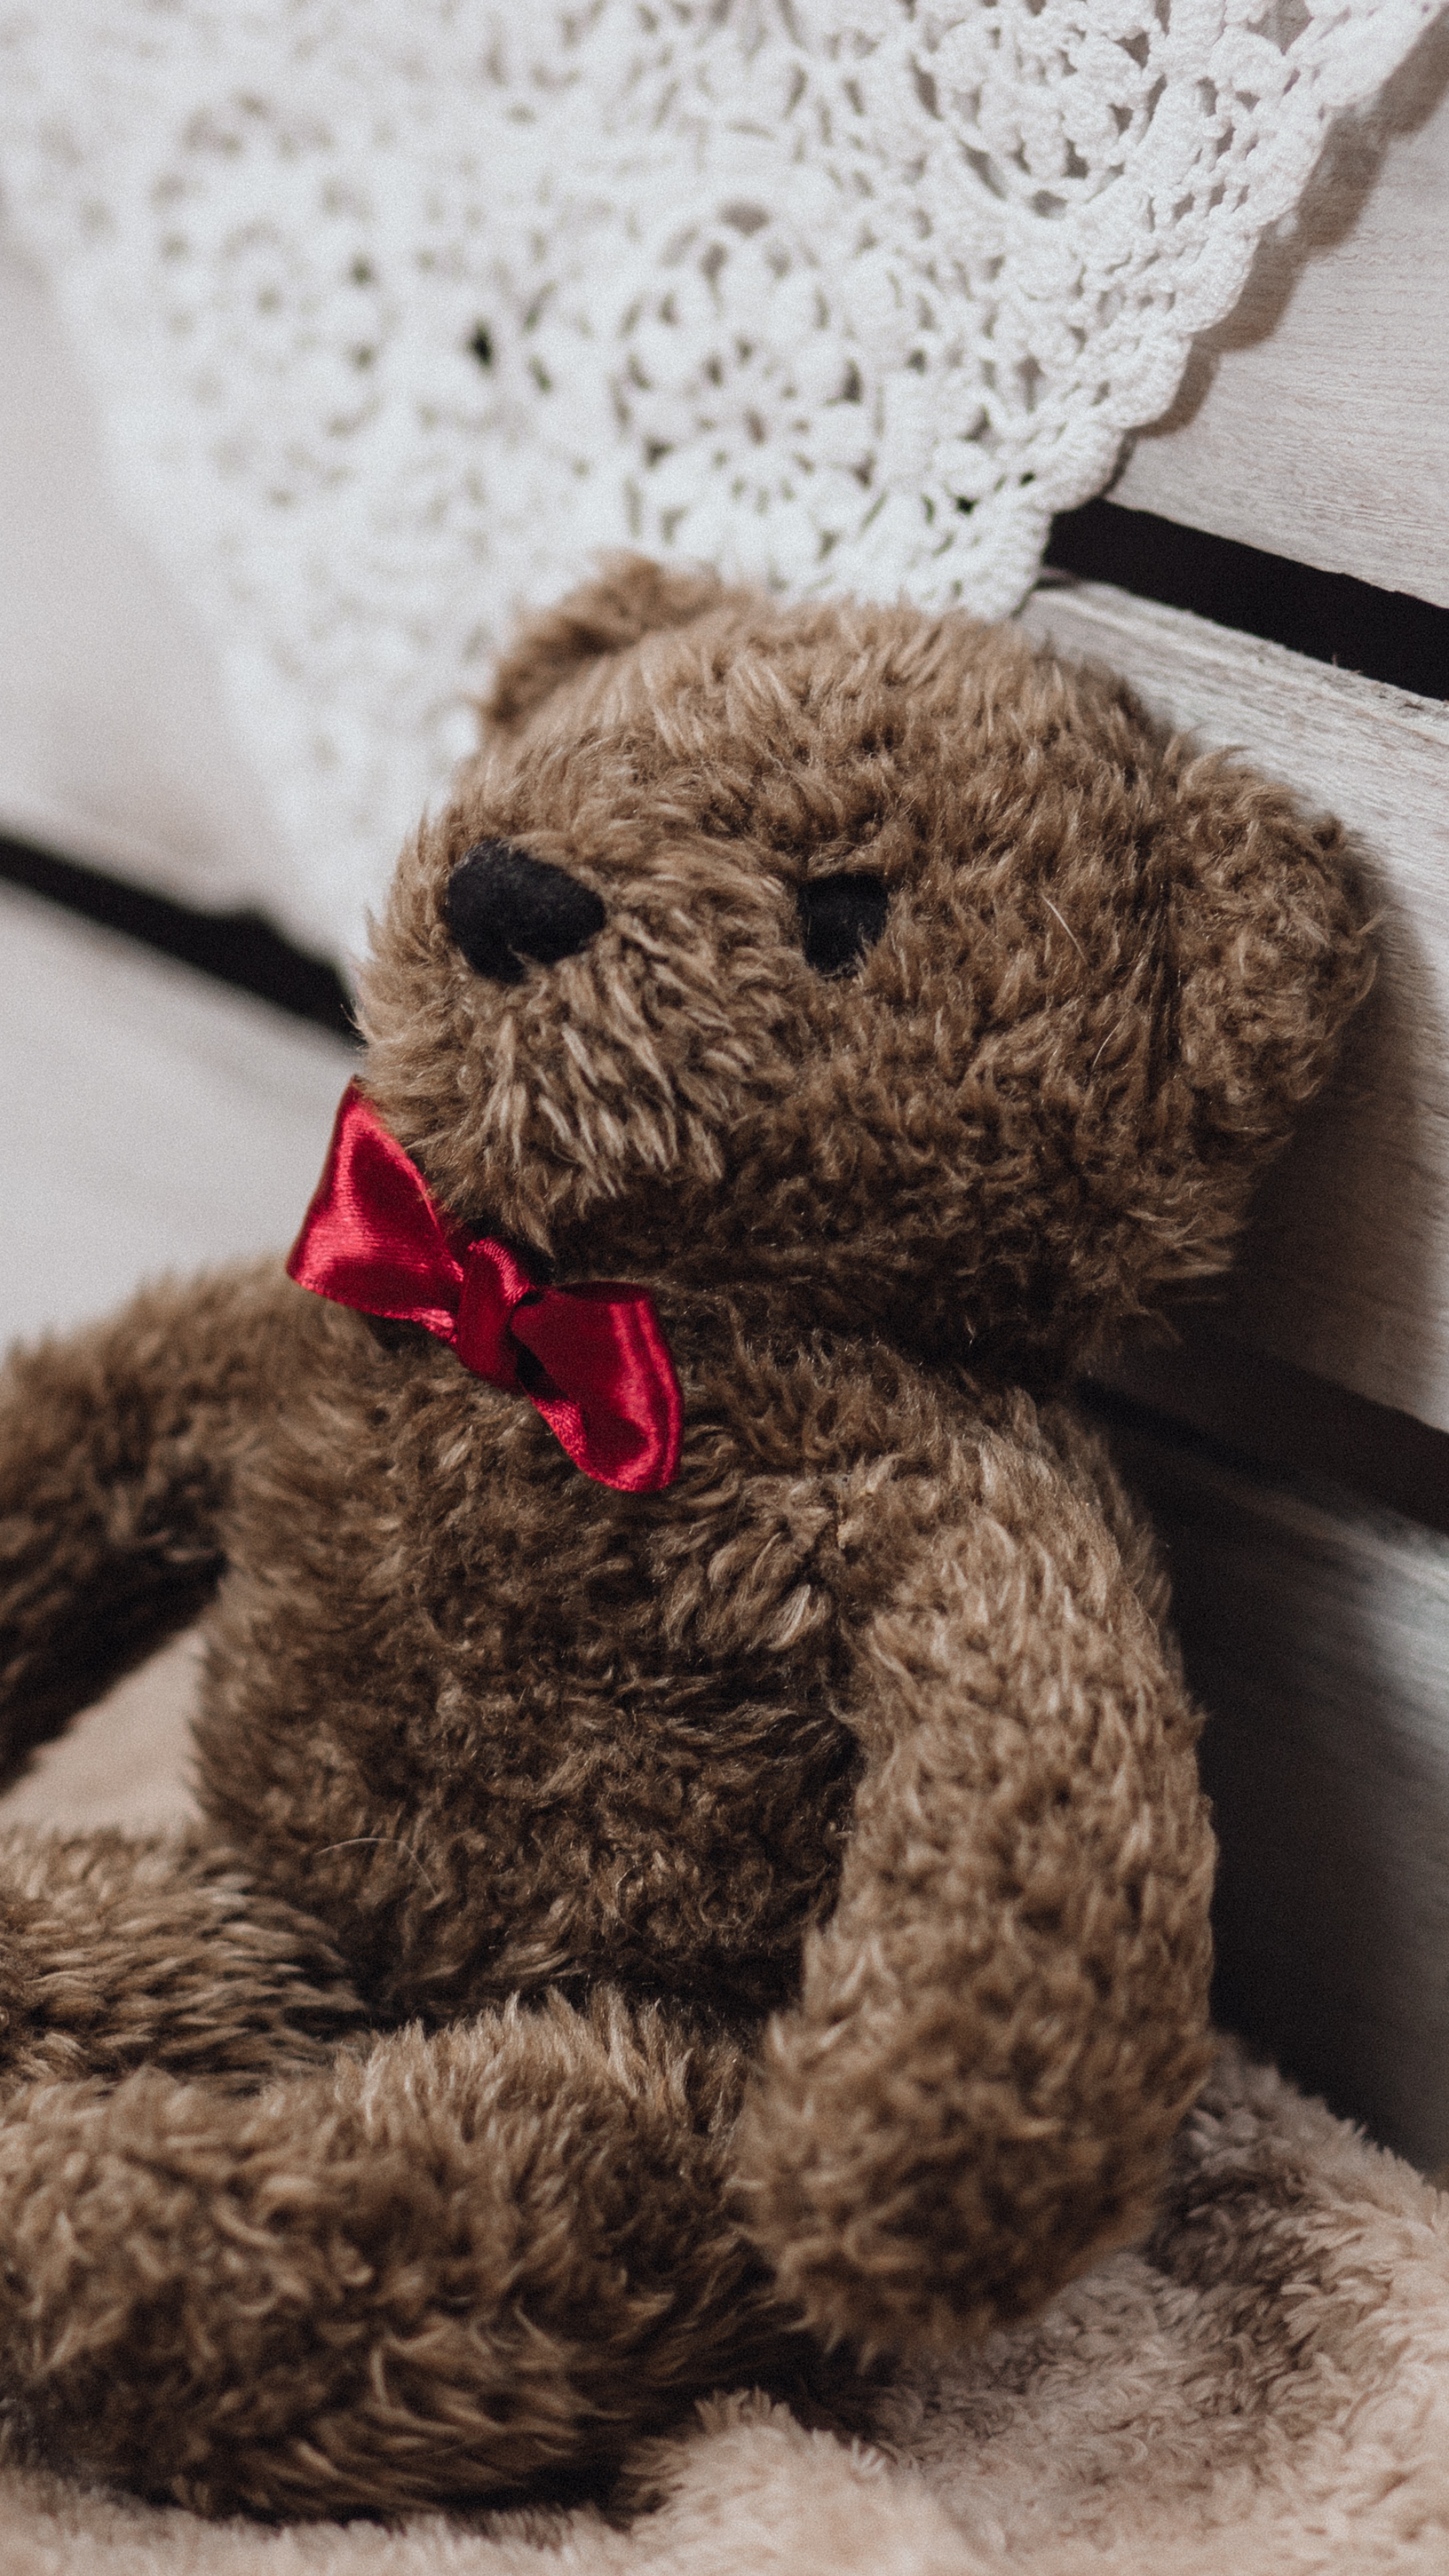 Top Wallpaper Mobile Teddy Bear - 4K-Teddy-Bear-Toy-Wallpaper-For-Mobile  Collection_45661.jpg